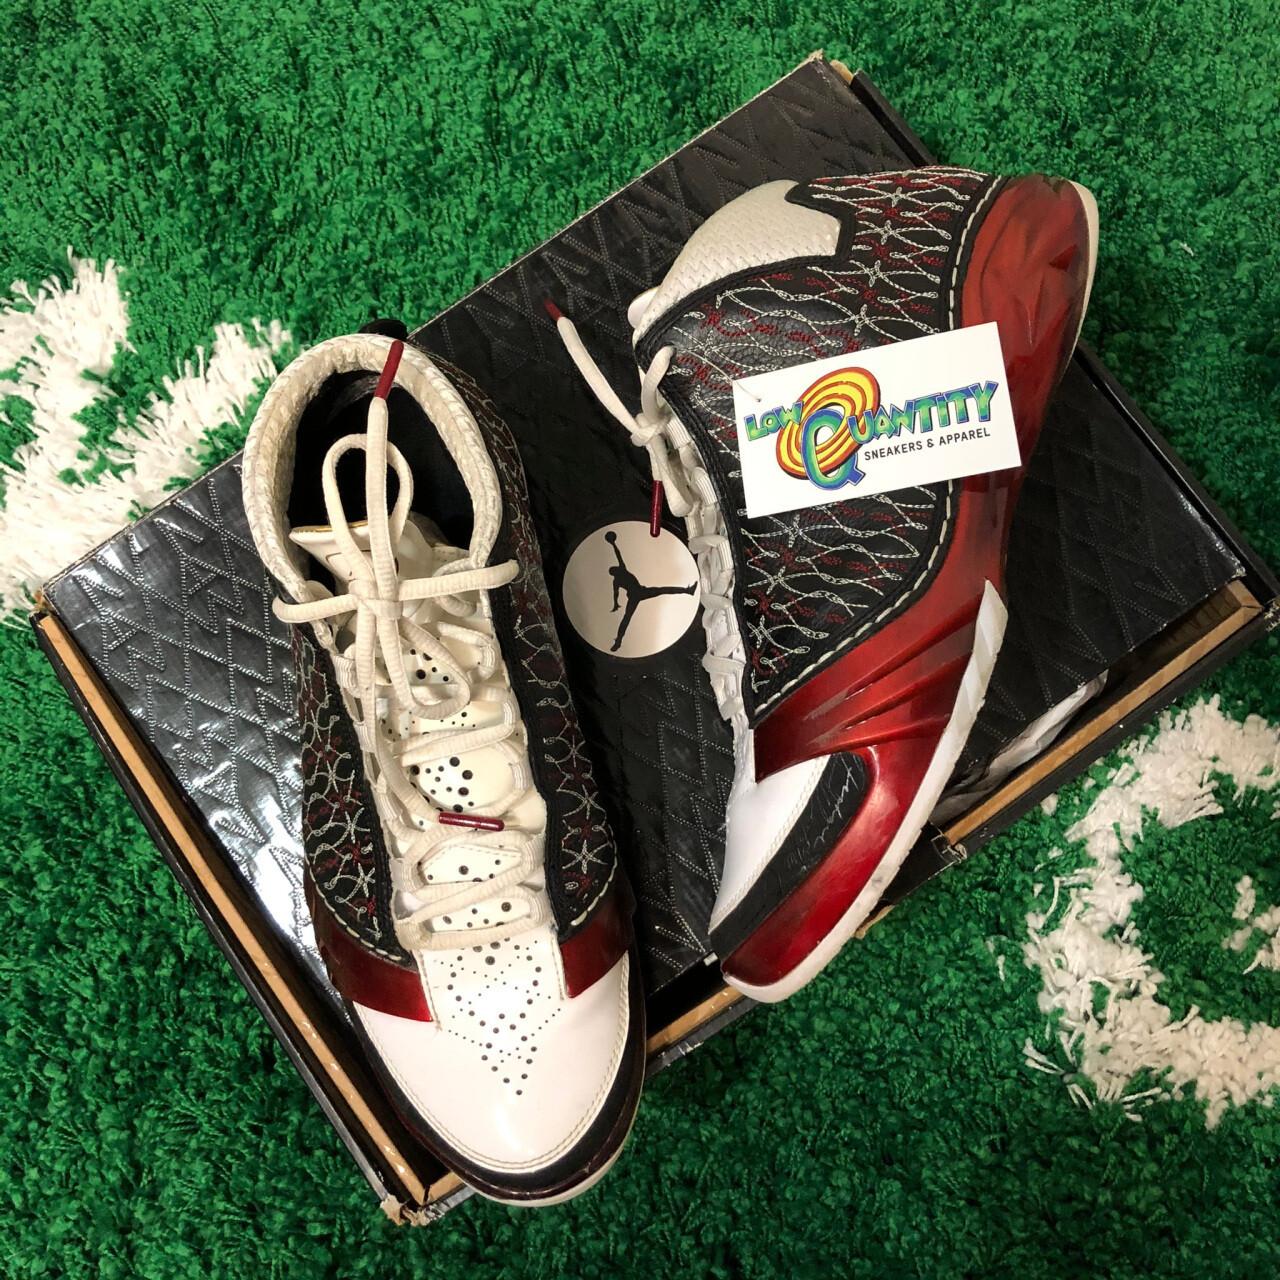 Nike Air Jordan 23 Size 11.5